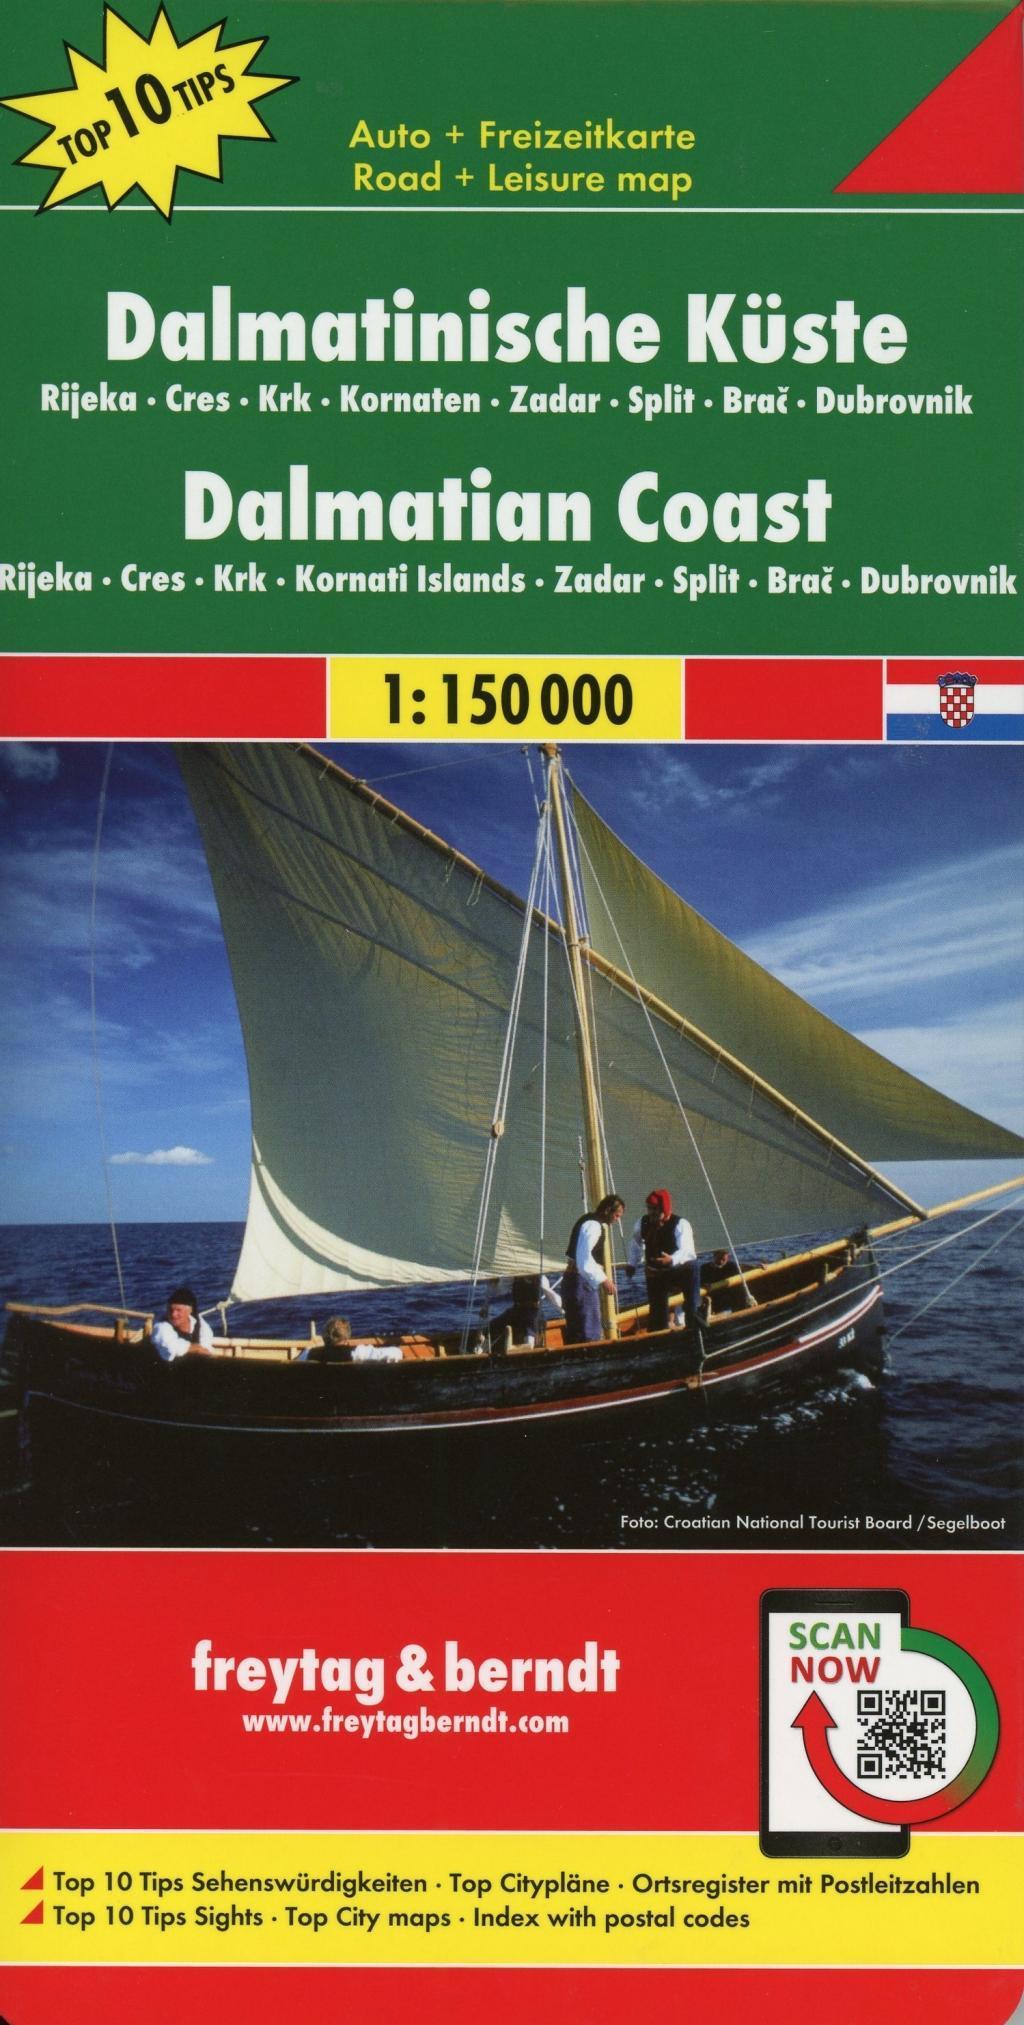 Dalmatinische Küste, Rijeka - Cres - Krk - Kornaten - Zadar - Split - Brac - Dubrovnik, Autokarte 1:150.000 | Top 10 Tips